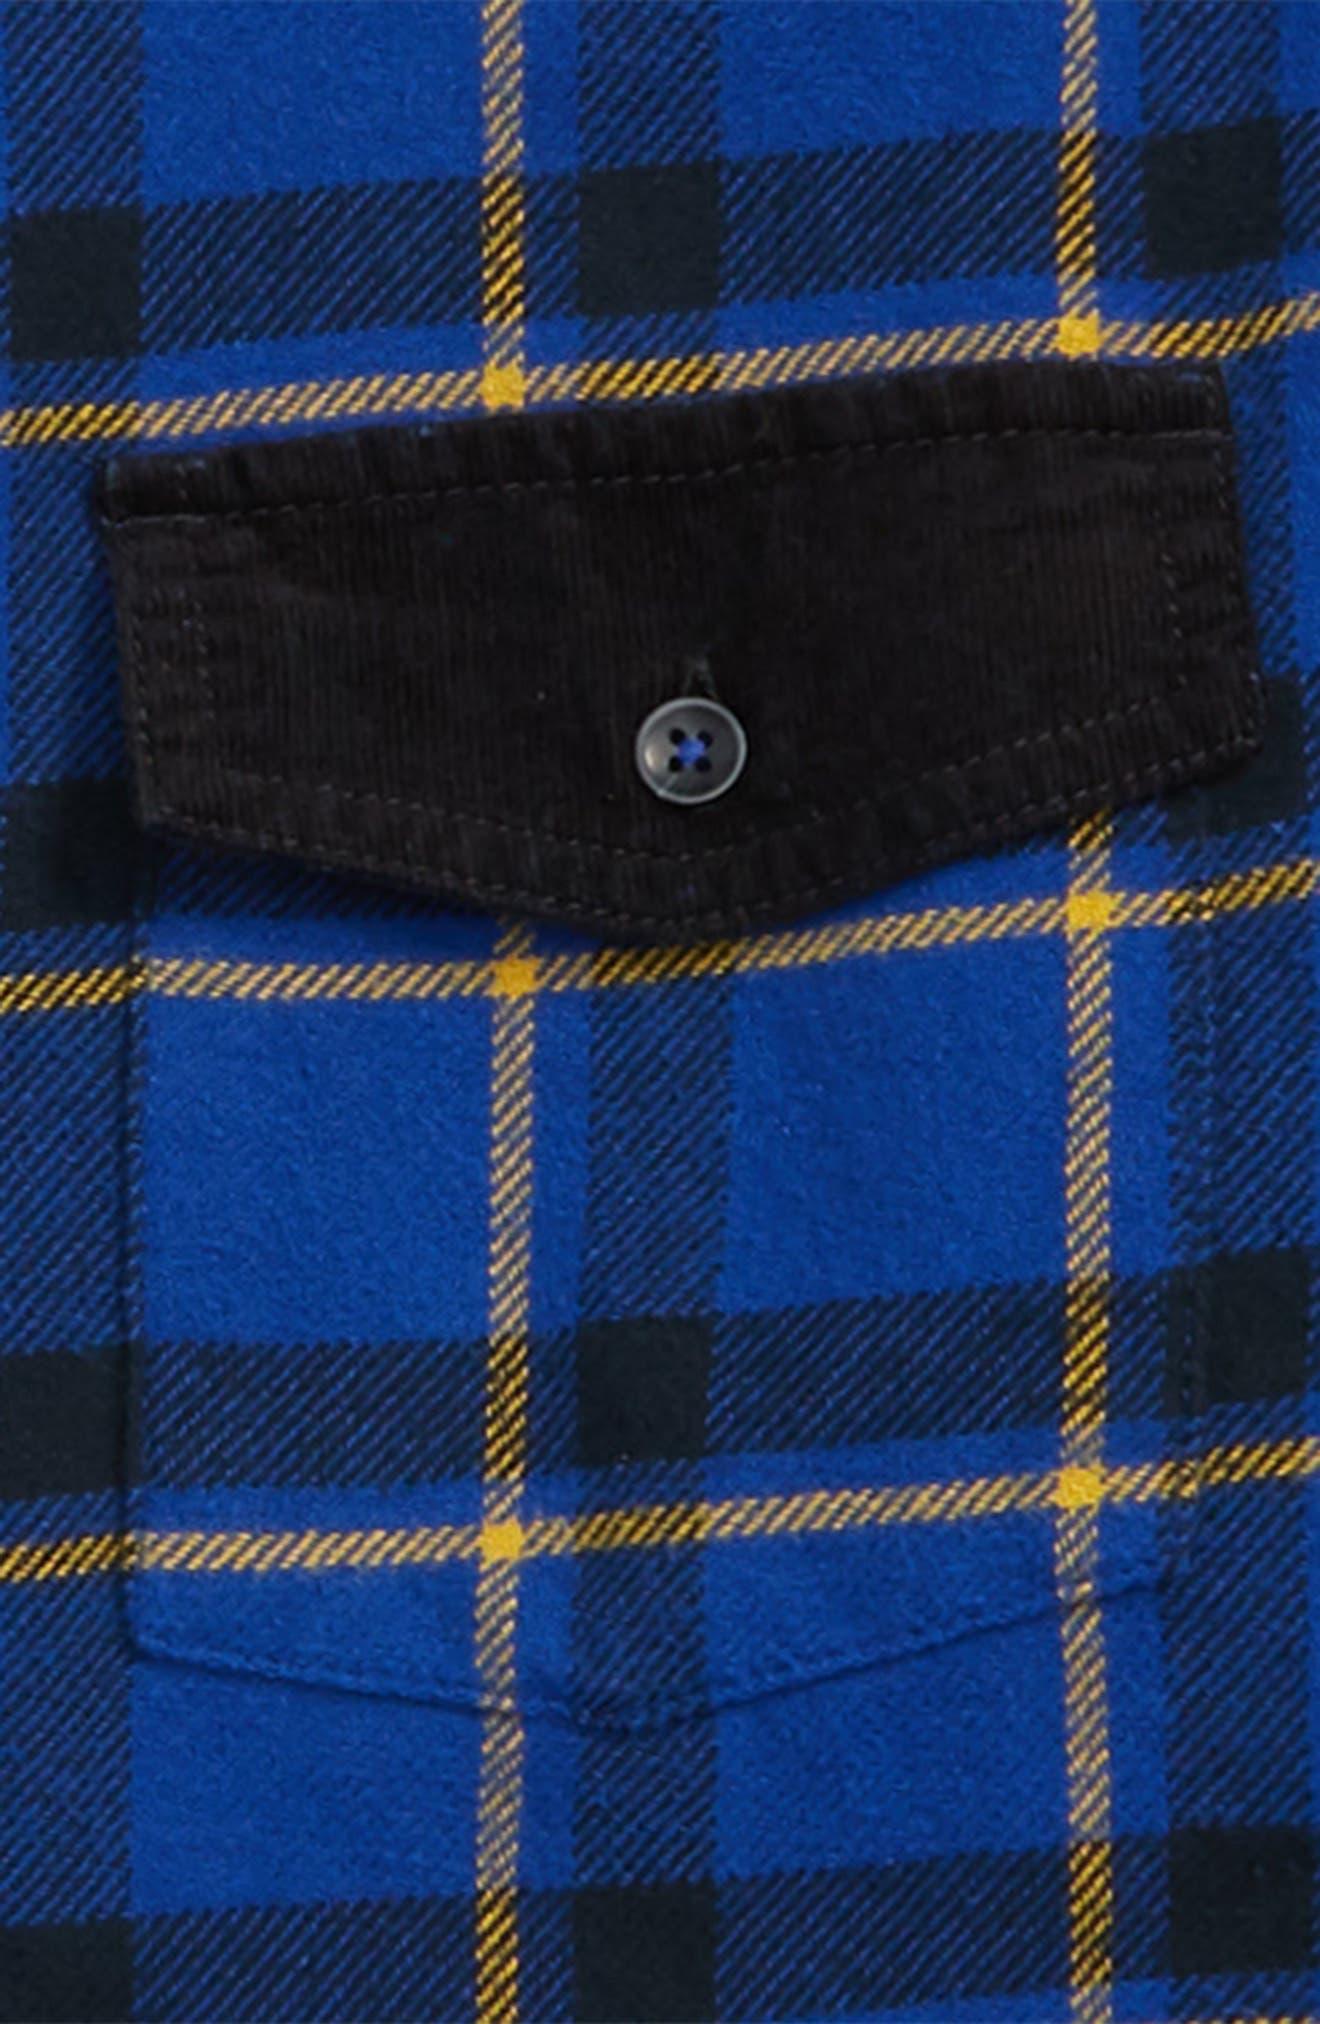 Plaid & Cord Shirt,                             Alternate thumbnail 2, color,                             BLUE MAZARINE SPACED OUT CHECK